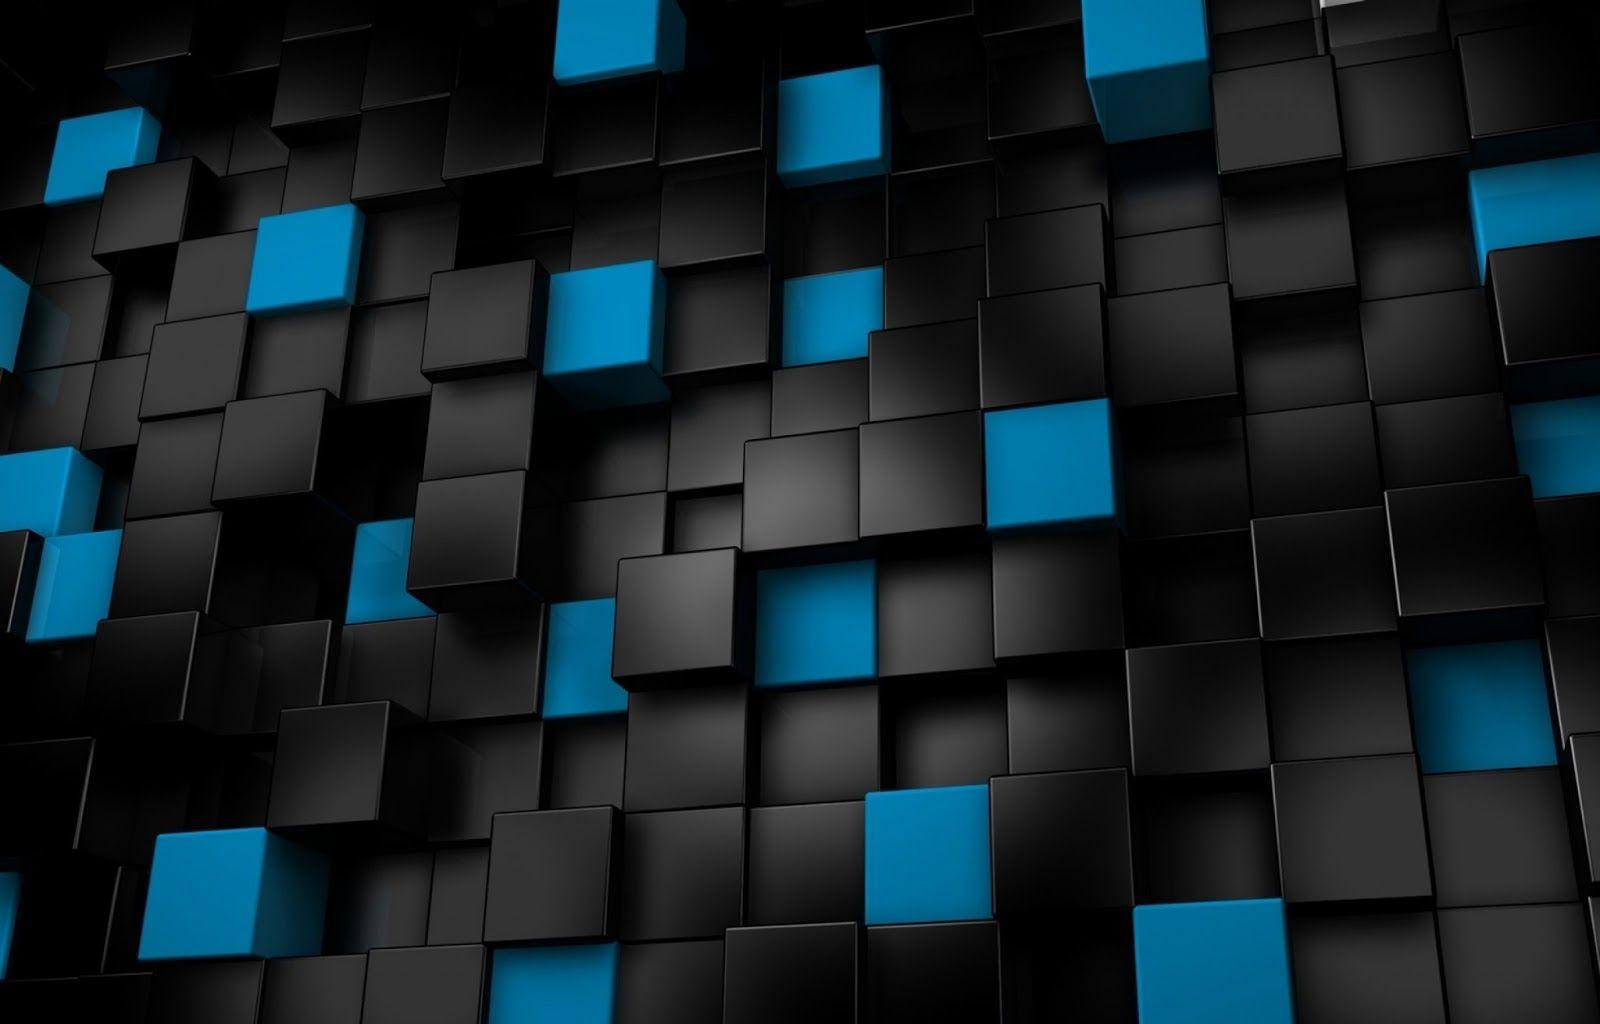 Block Wallpapers Top Free Block Backgrounds Wallpaperaccess